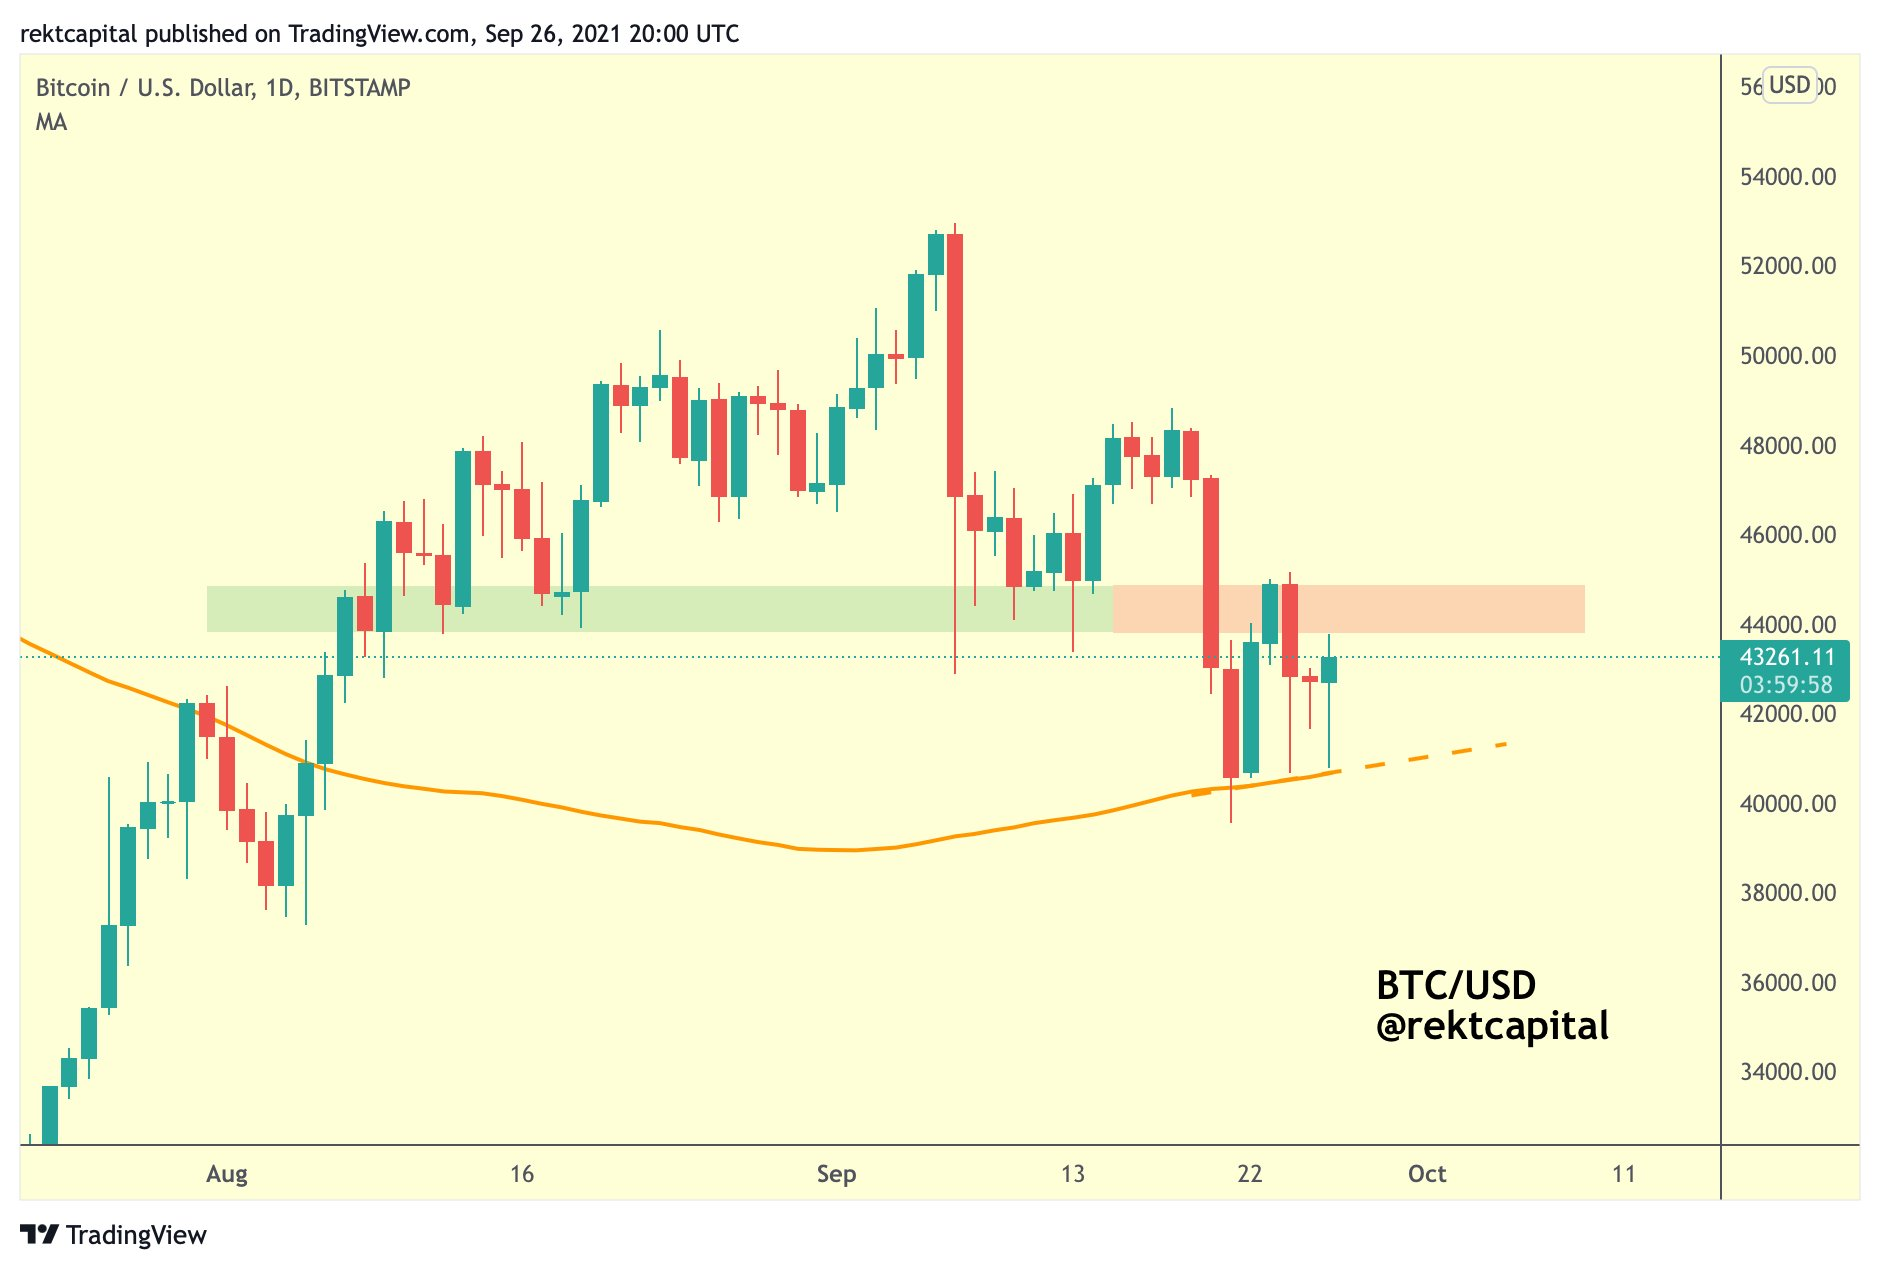 Scenario in BTC/USD